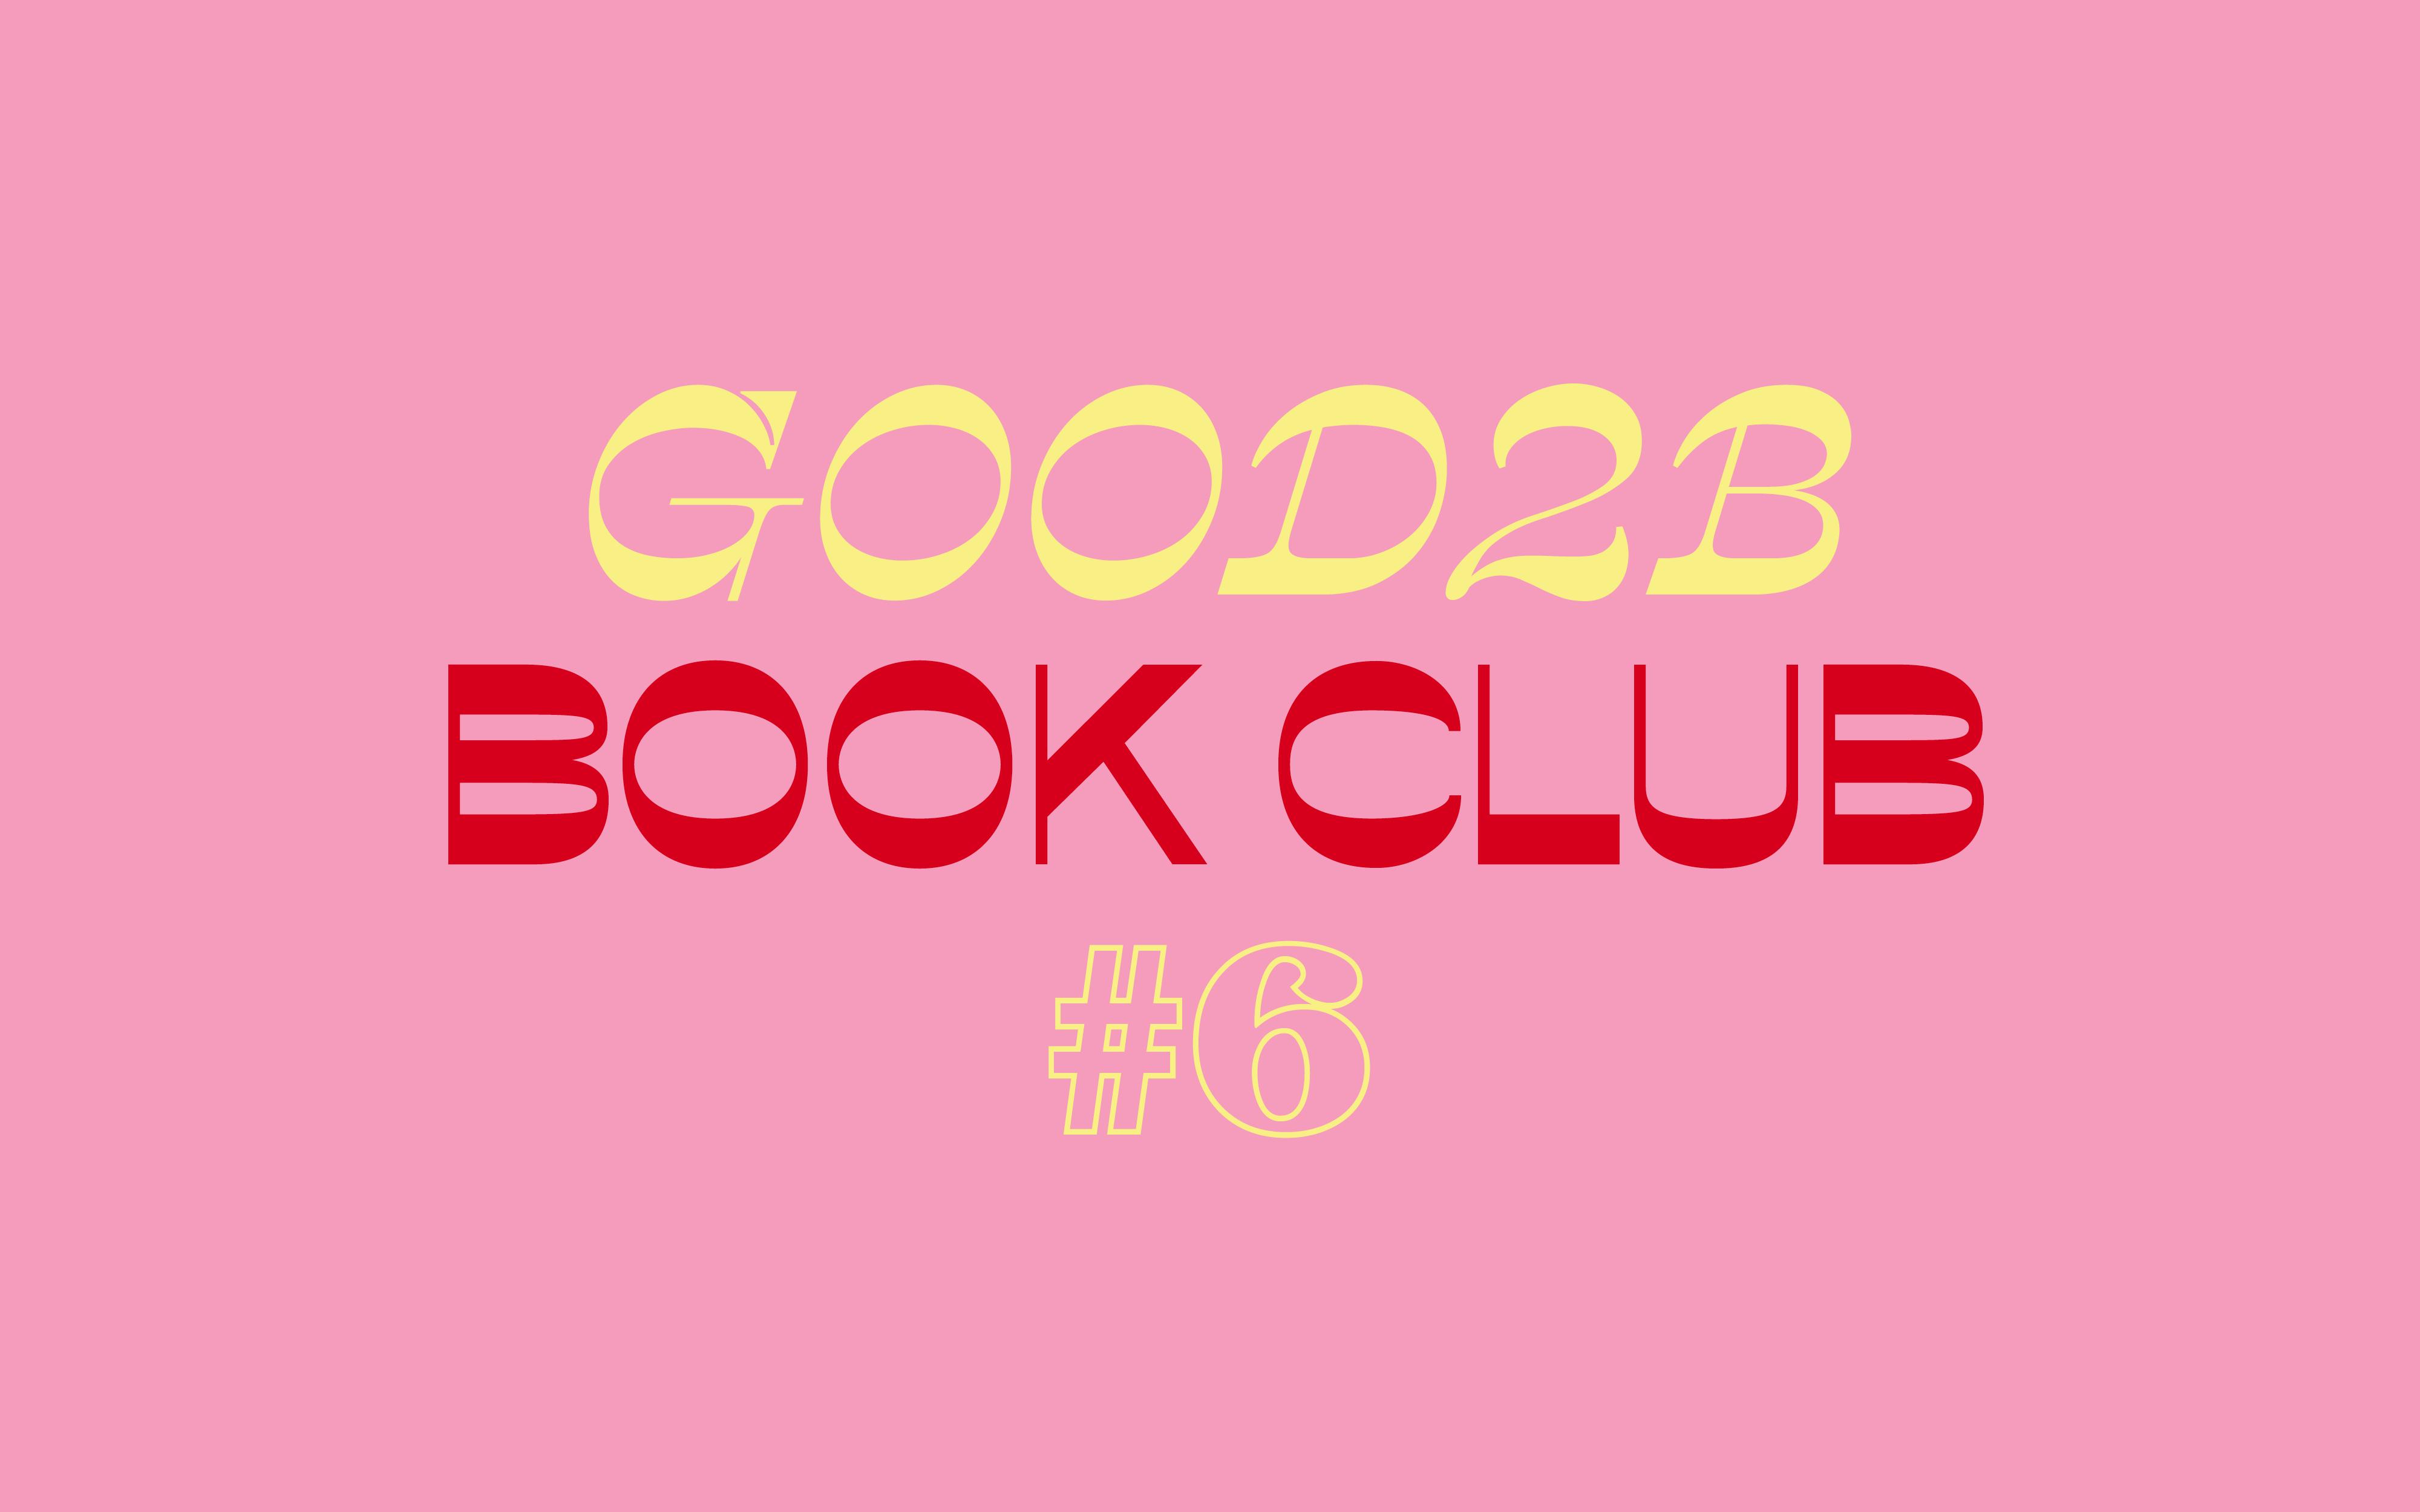 Good2b Book Club #6: 'Americanah', de Chimamanda Ngozi Adichie